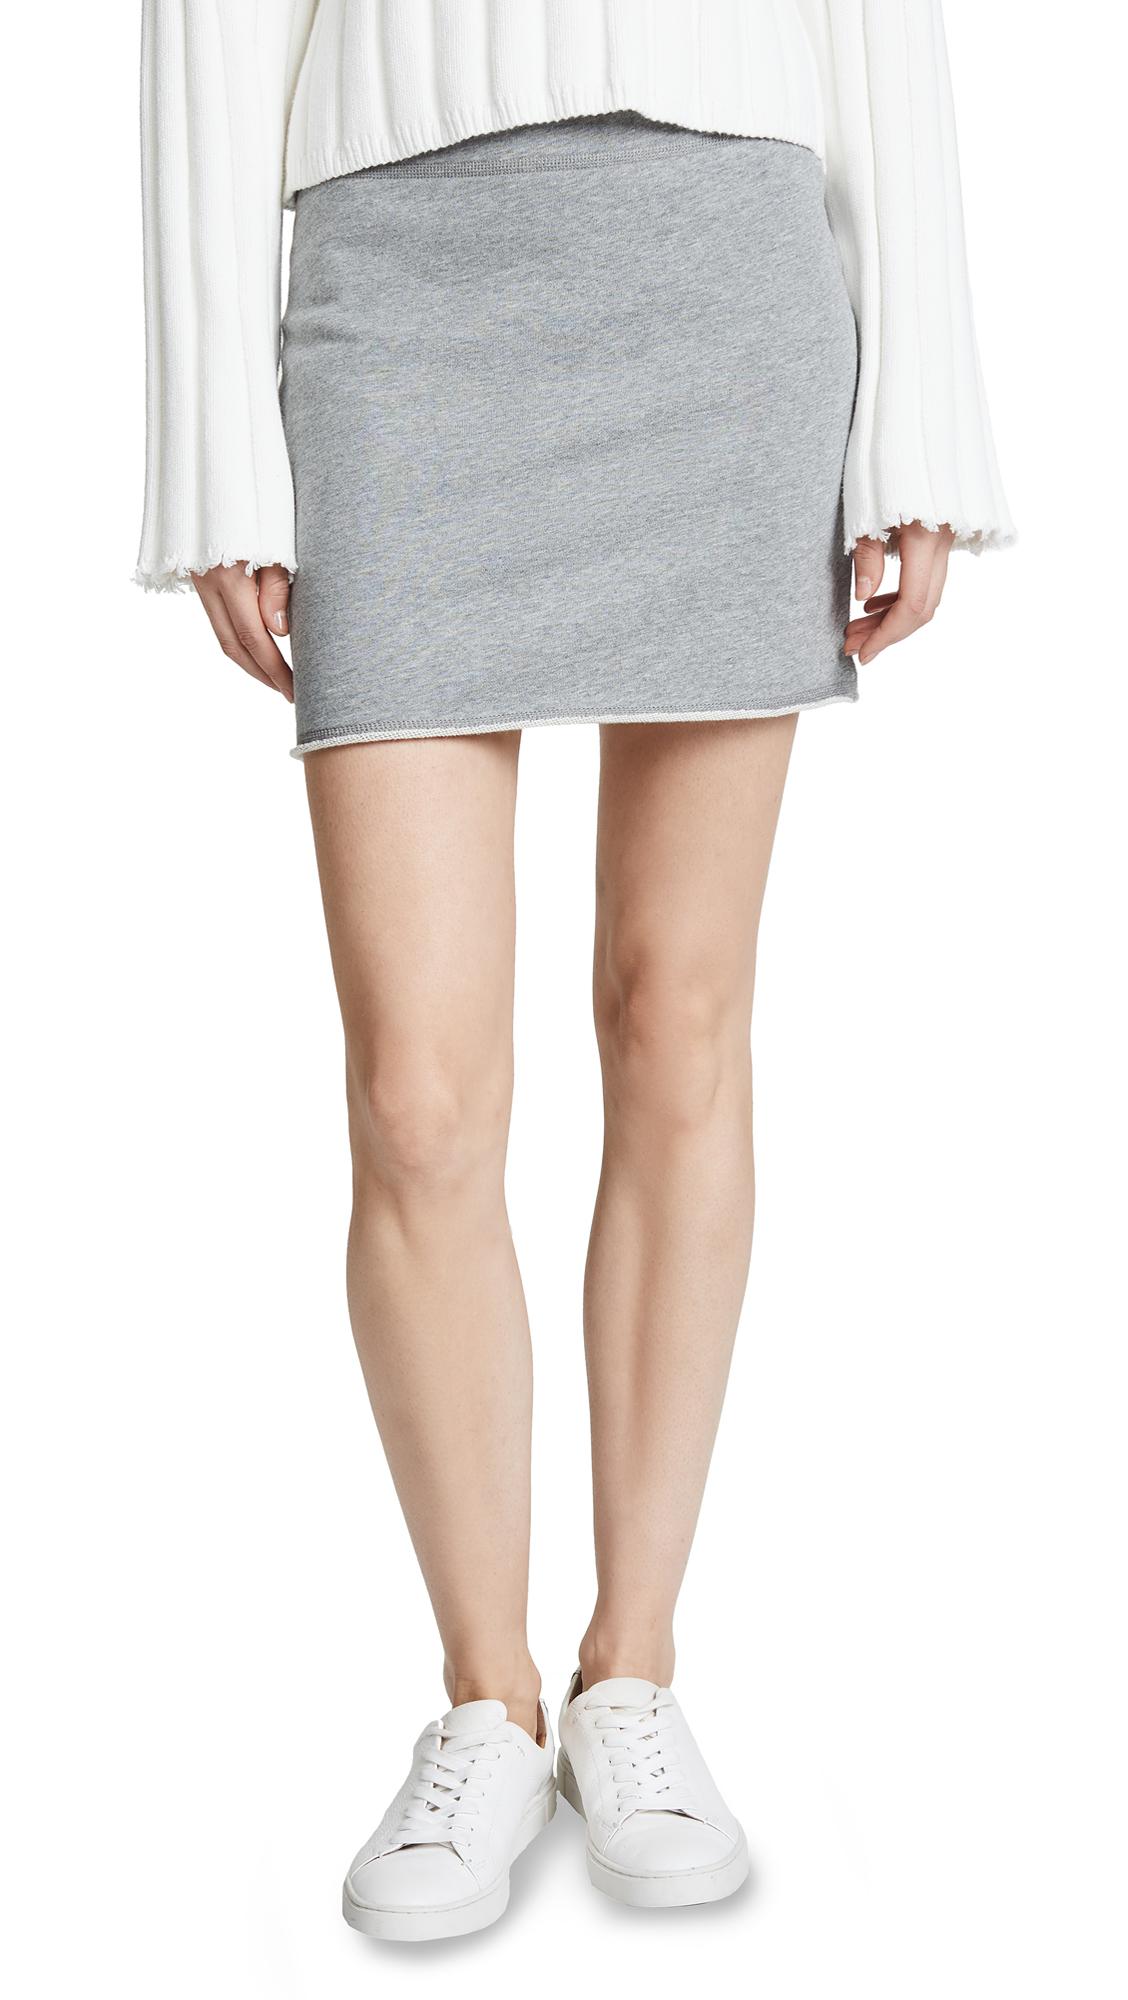 Rag & Bone/JEAN Marlie Skirt In Heather Grey